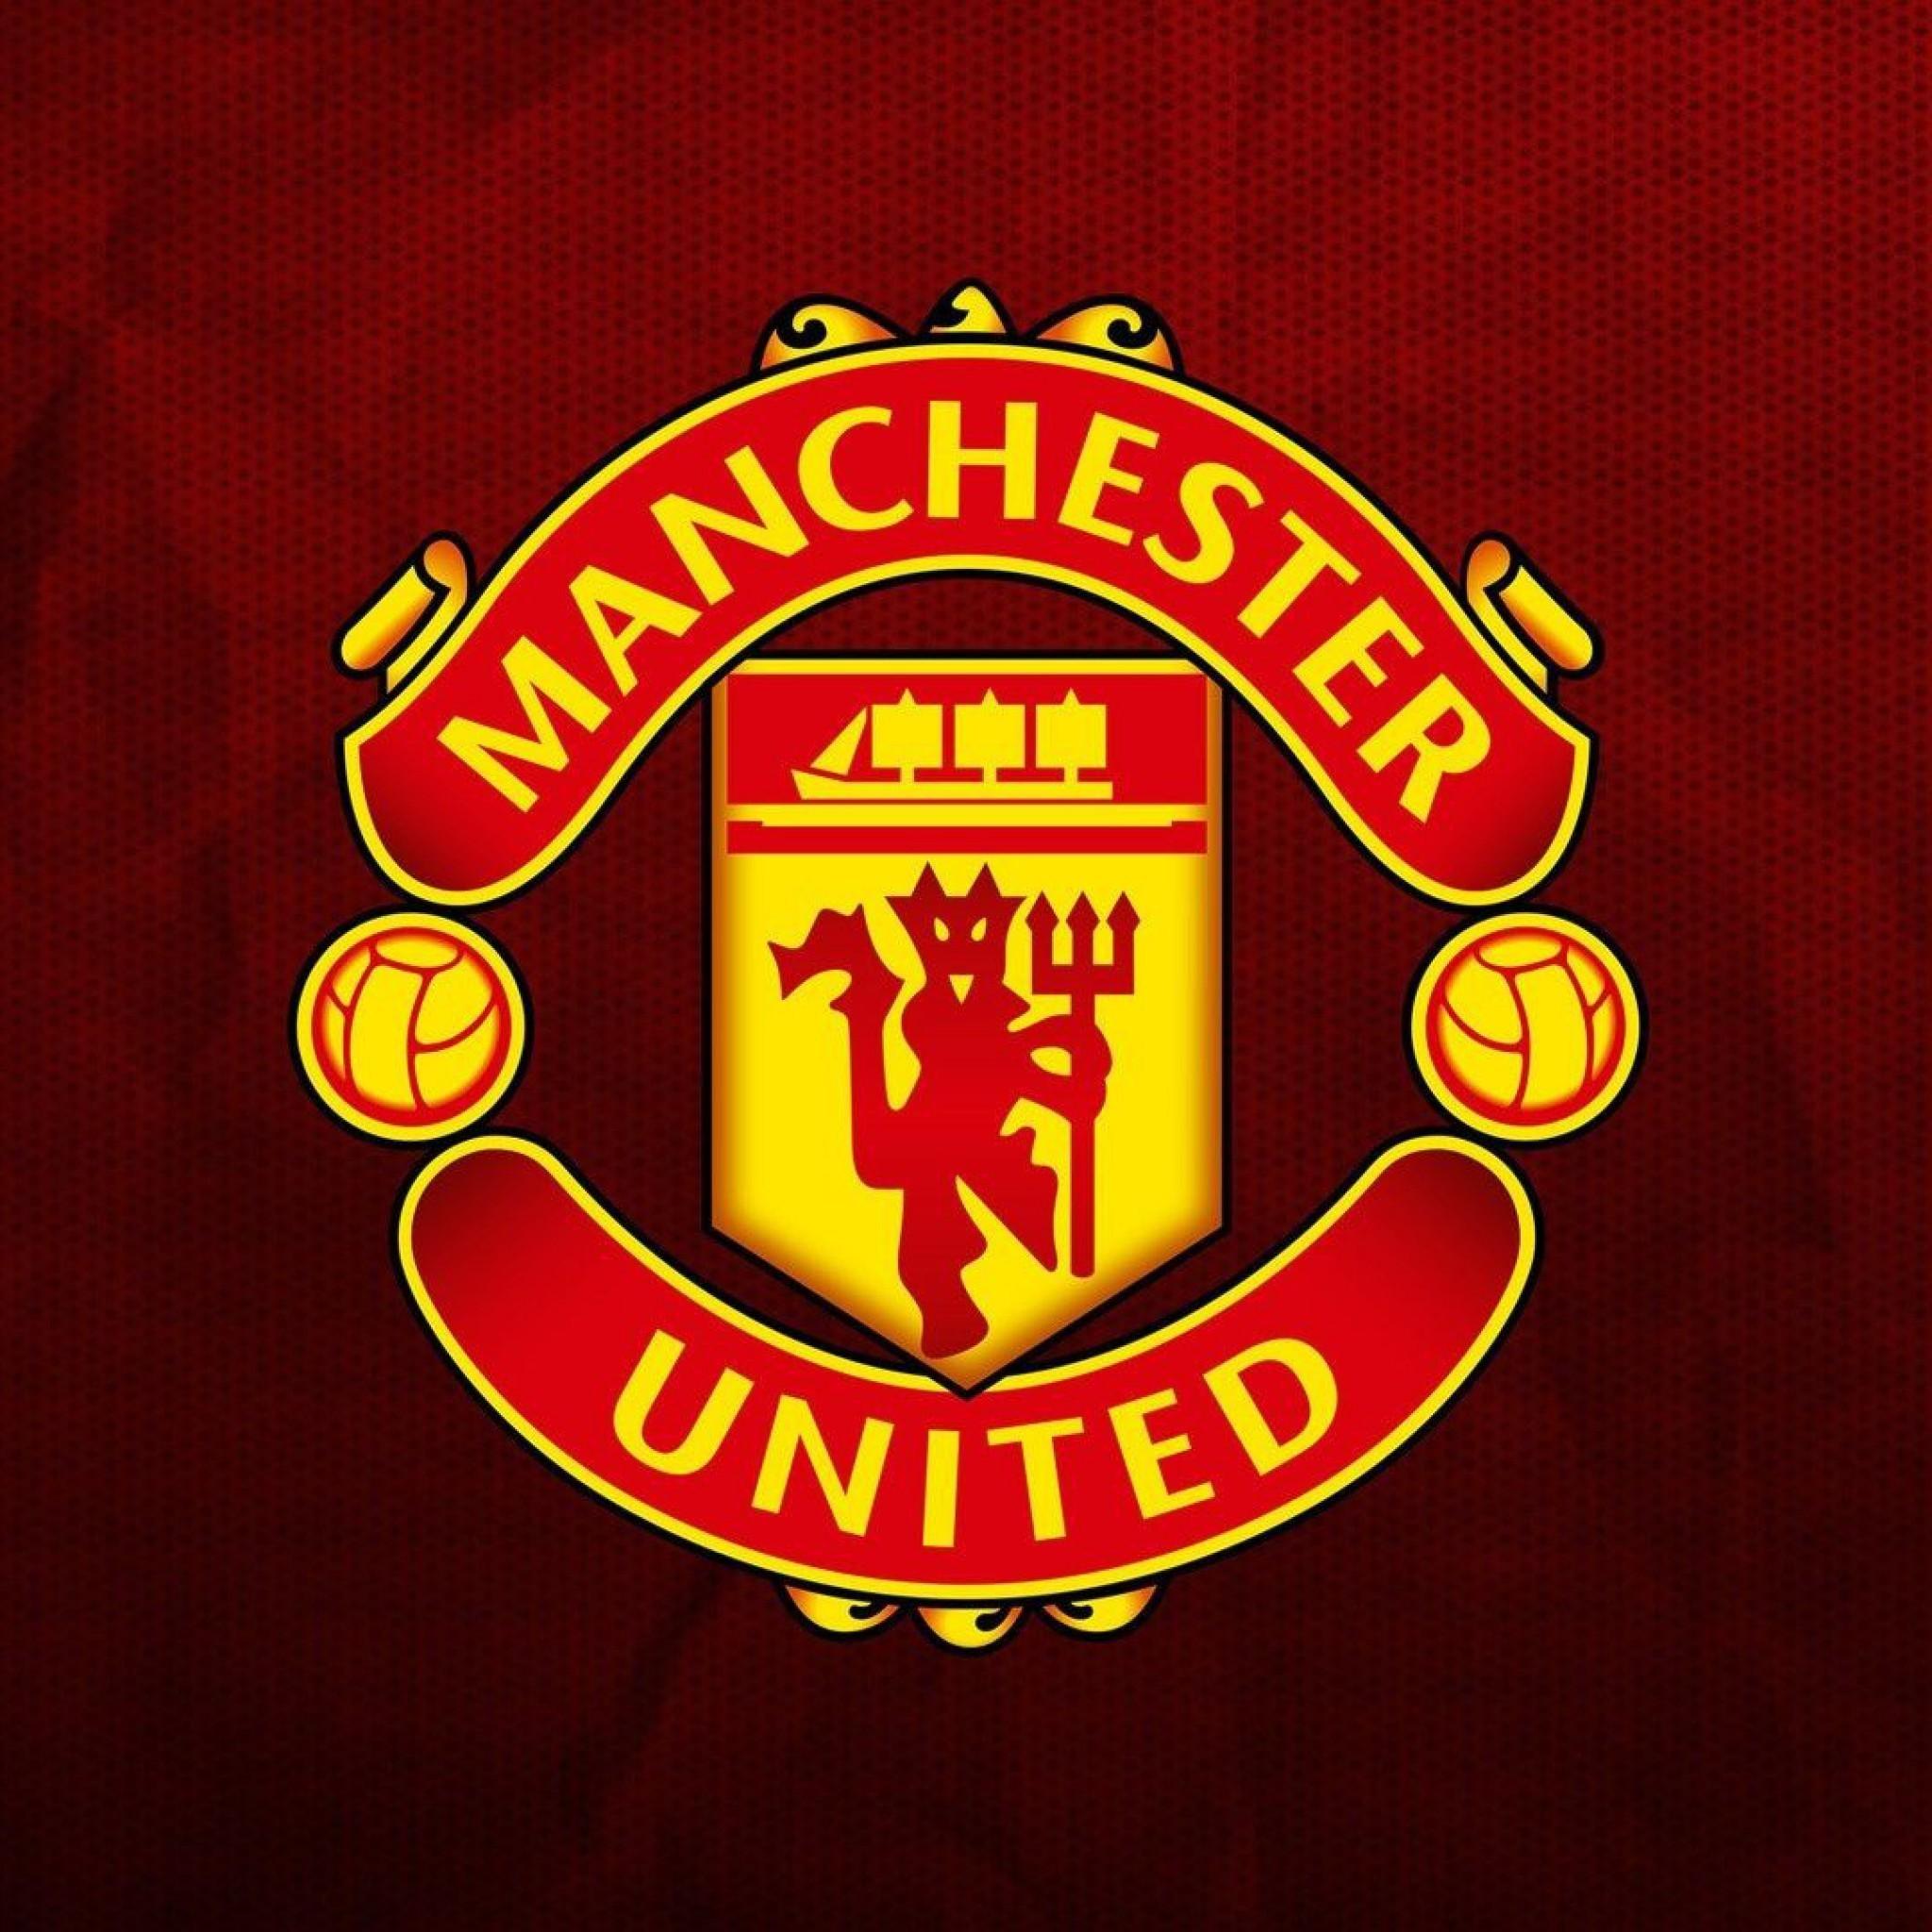 Manchester United Logo Wallpaper 3d Manchester United Wallpaper 3d 2018 62 Images